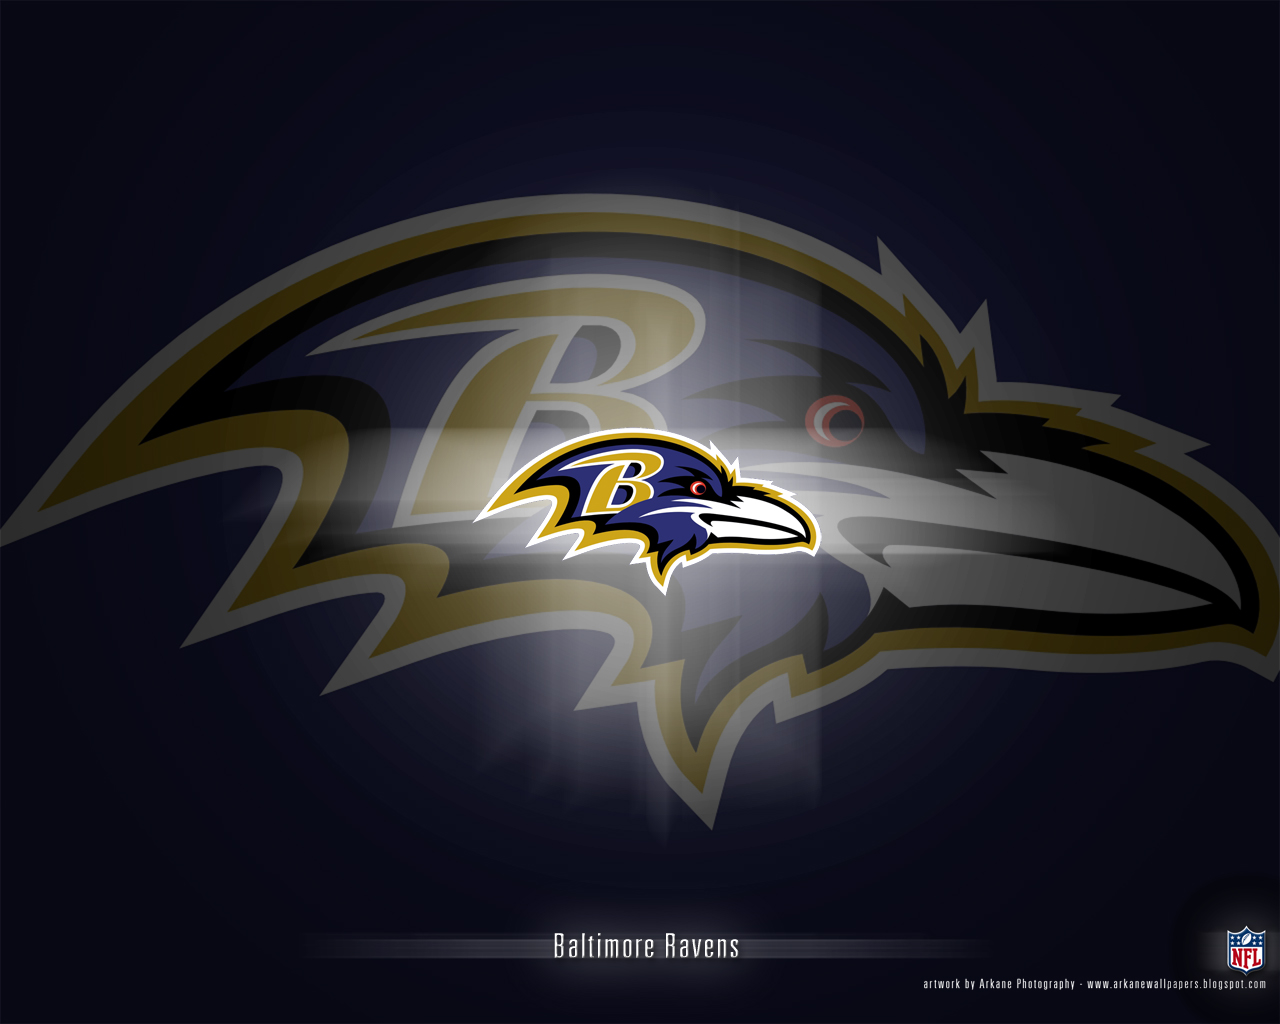 Arkane NFL Wallpapers: Baltimore Ravens - Vol. 1